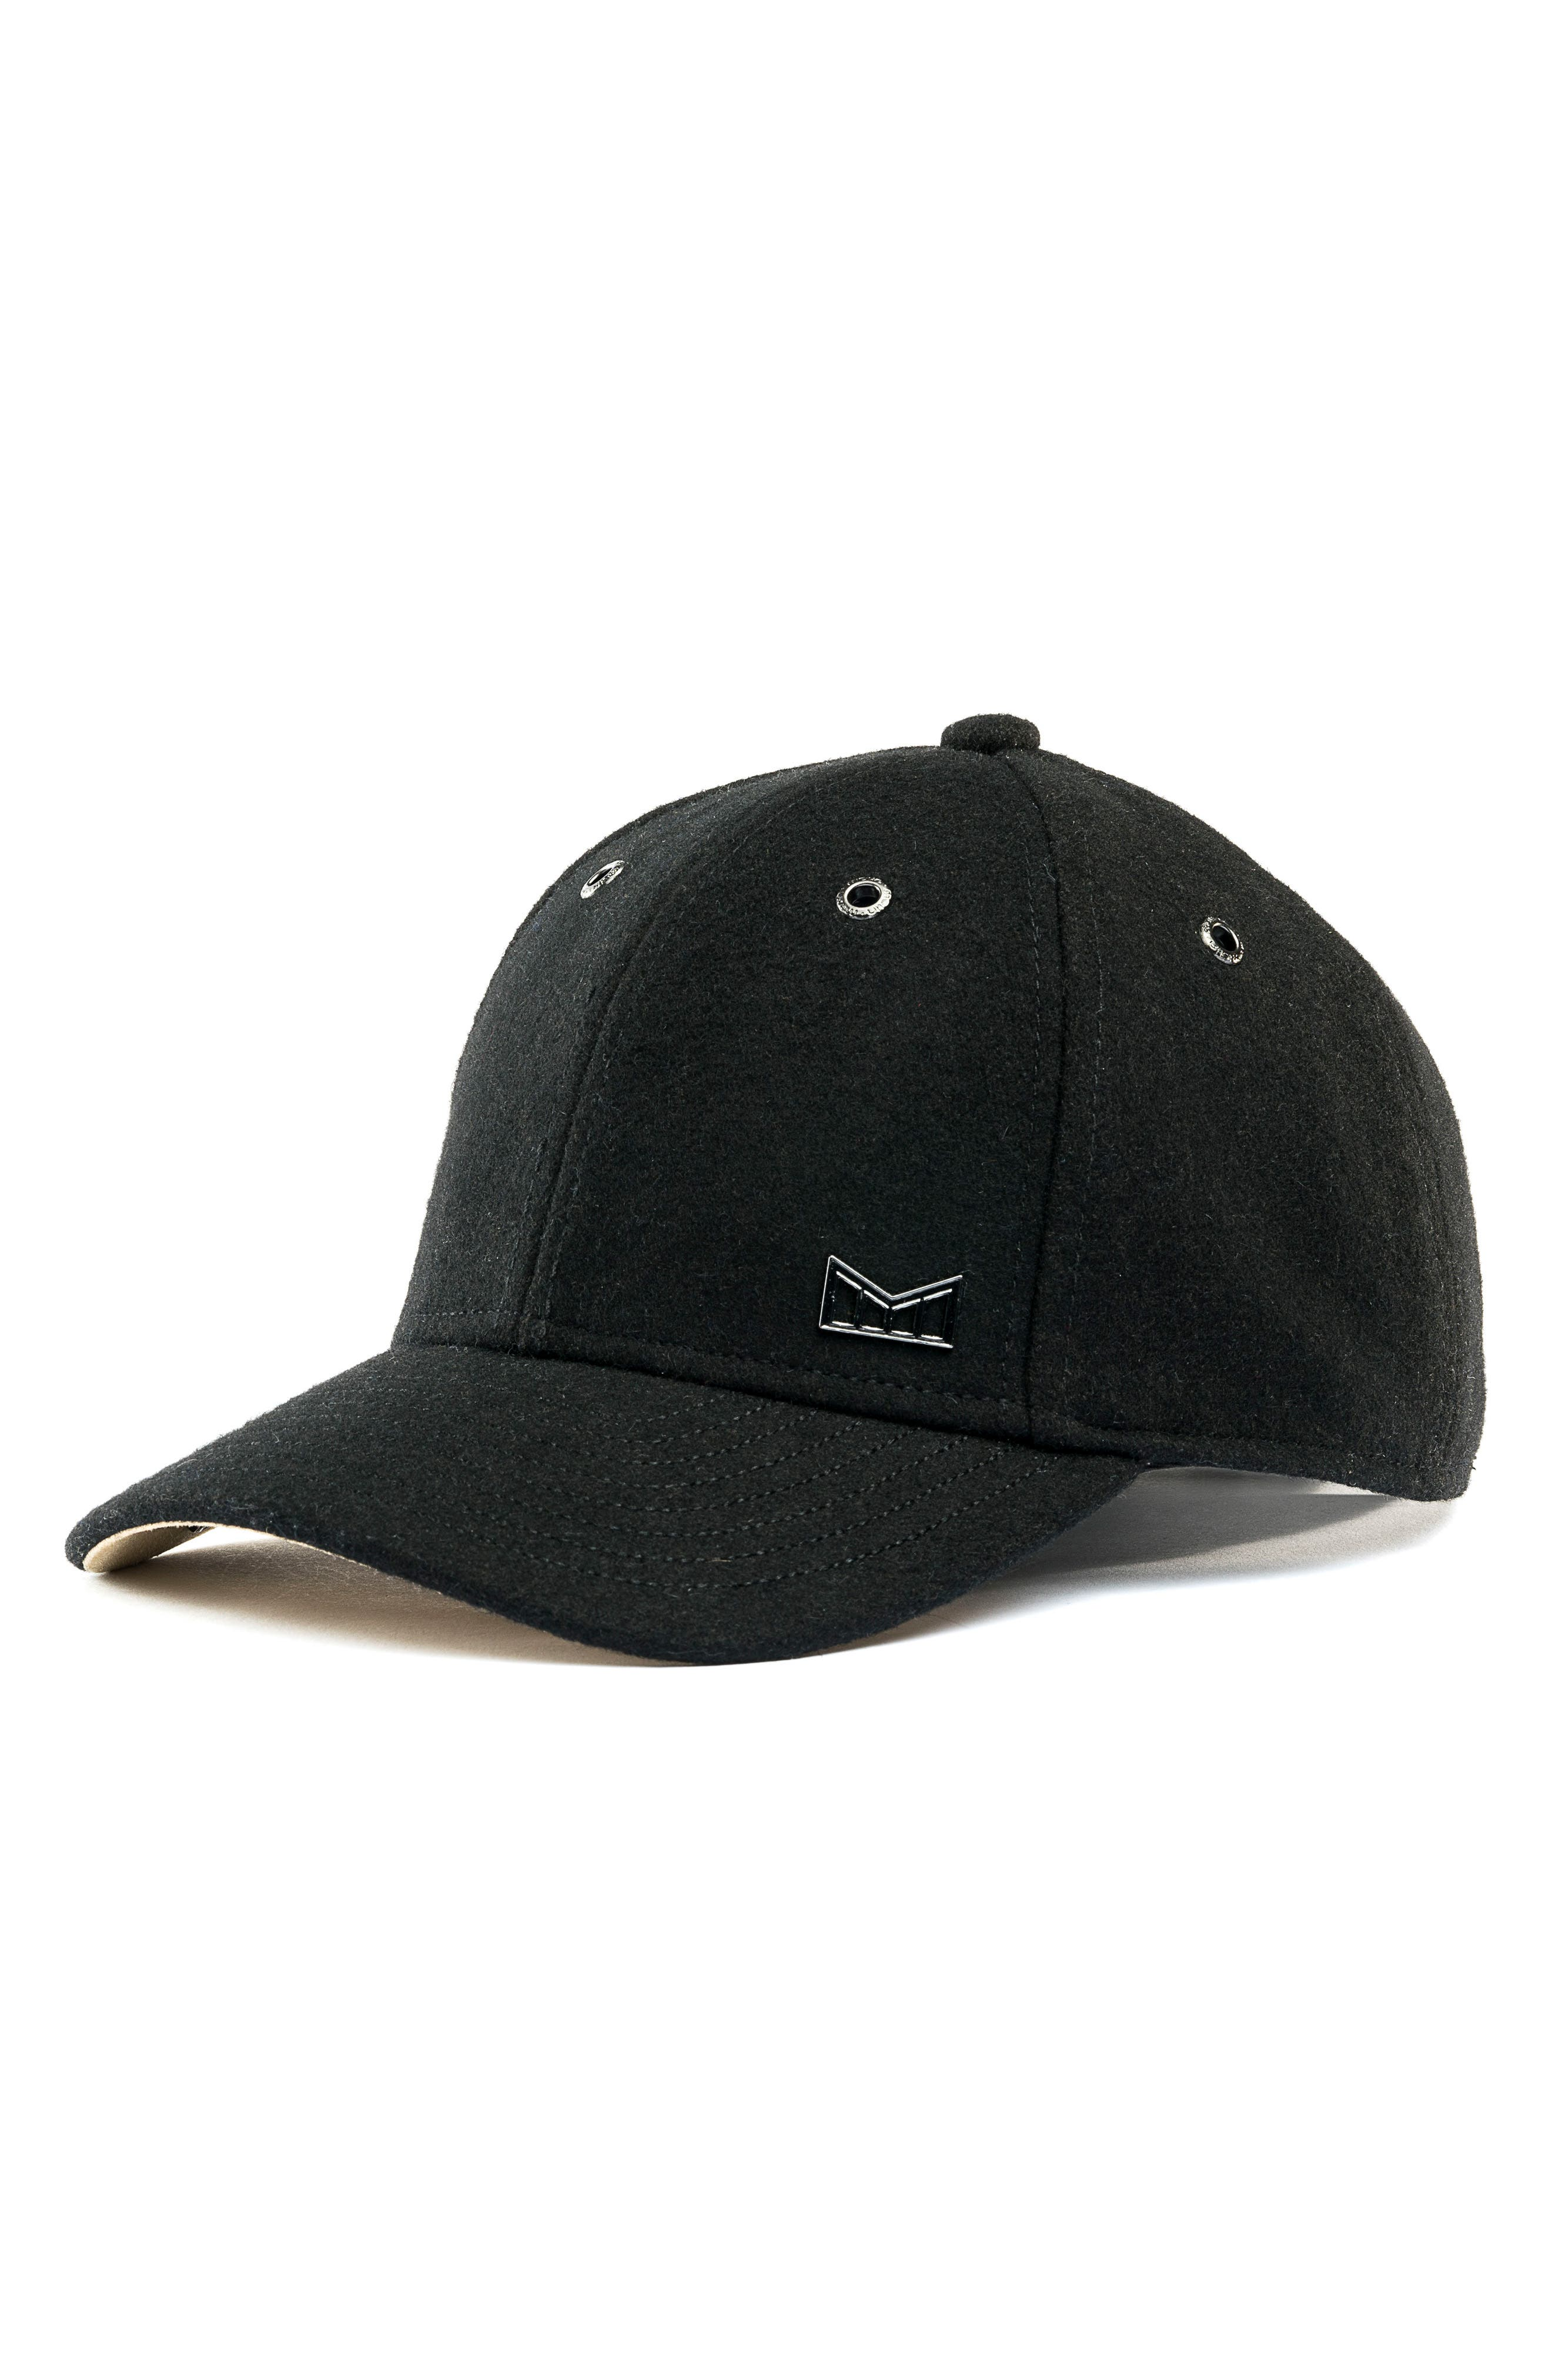 Melin 'Glory Days' Snapback Baseball Cap